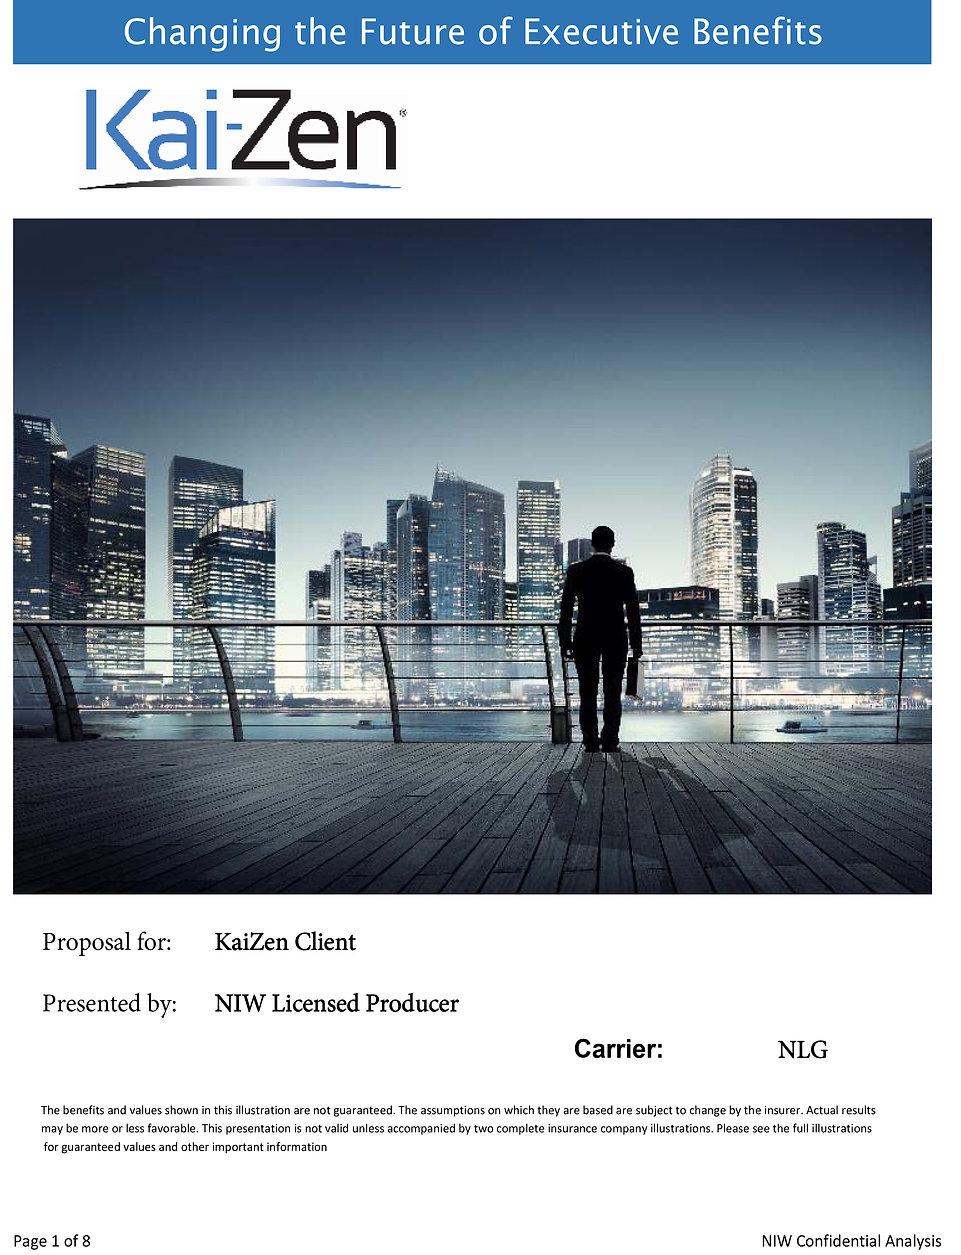 Example Kaizen-1.jpg